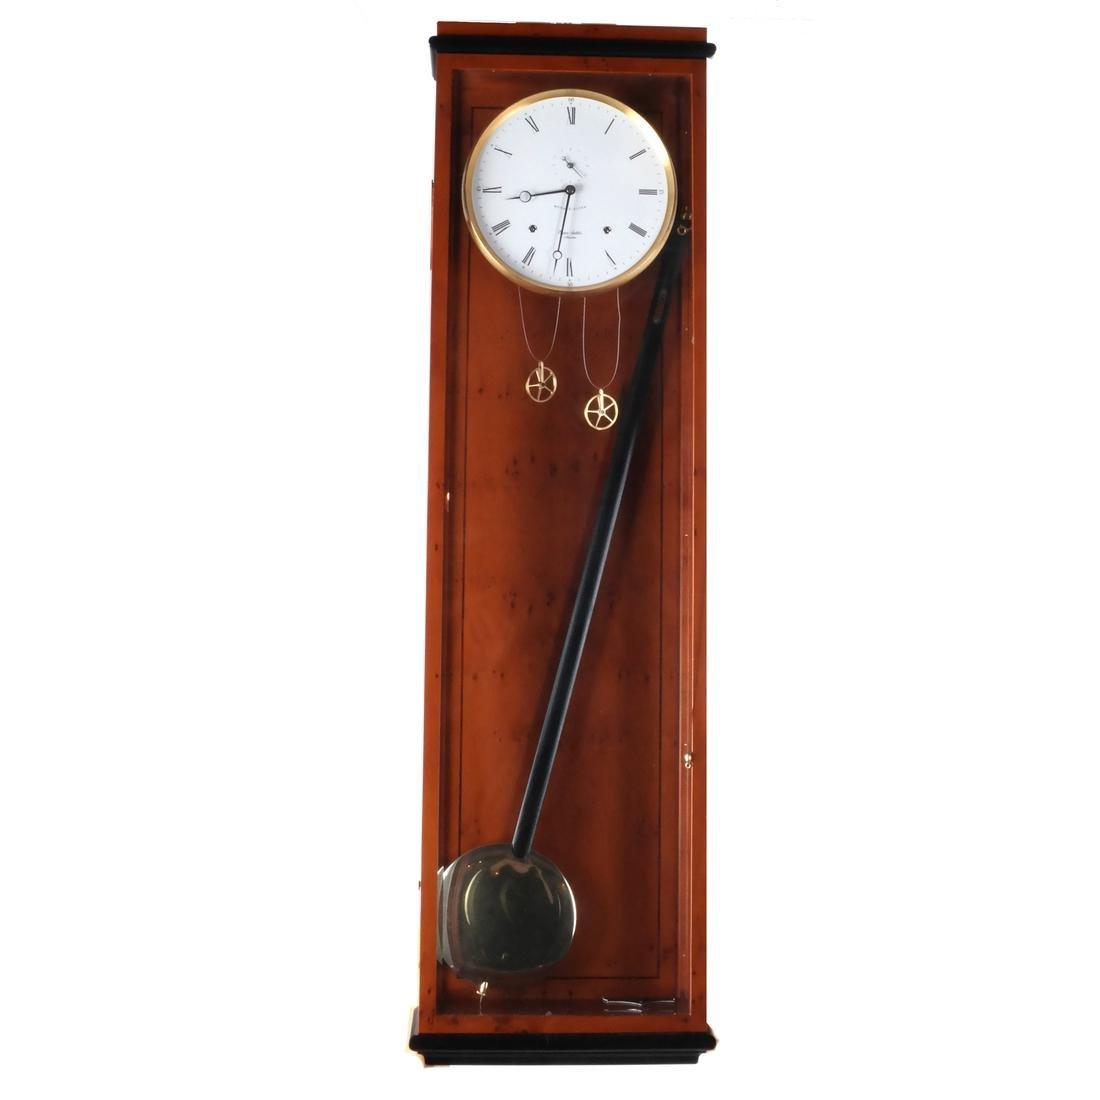 Monatslaufer Regulator Wall Clock